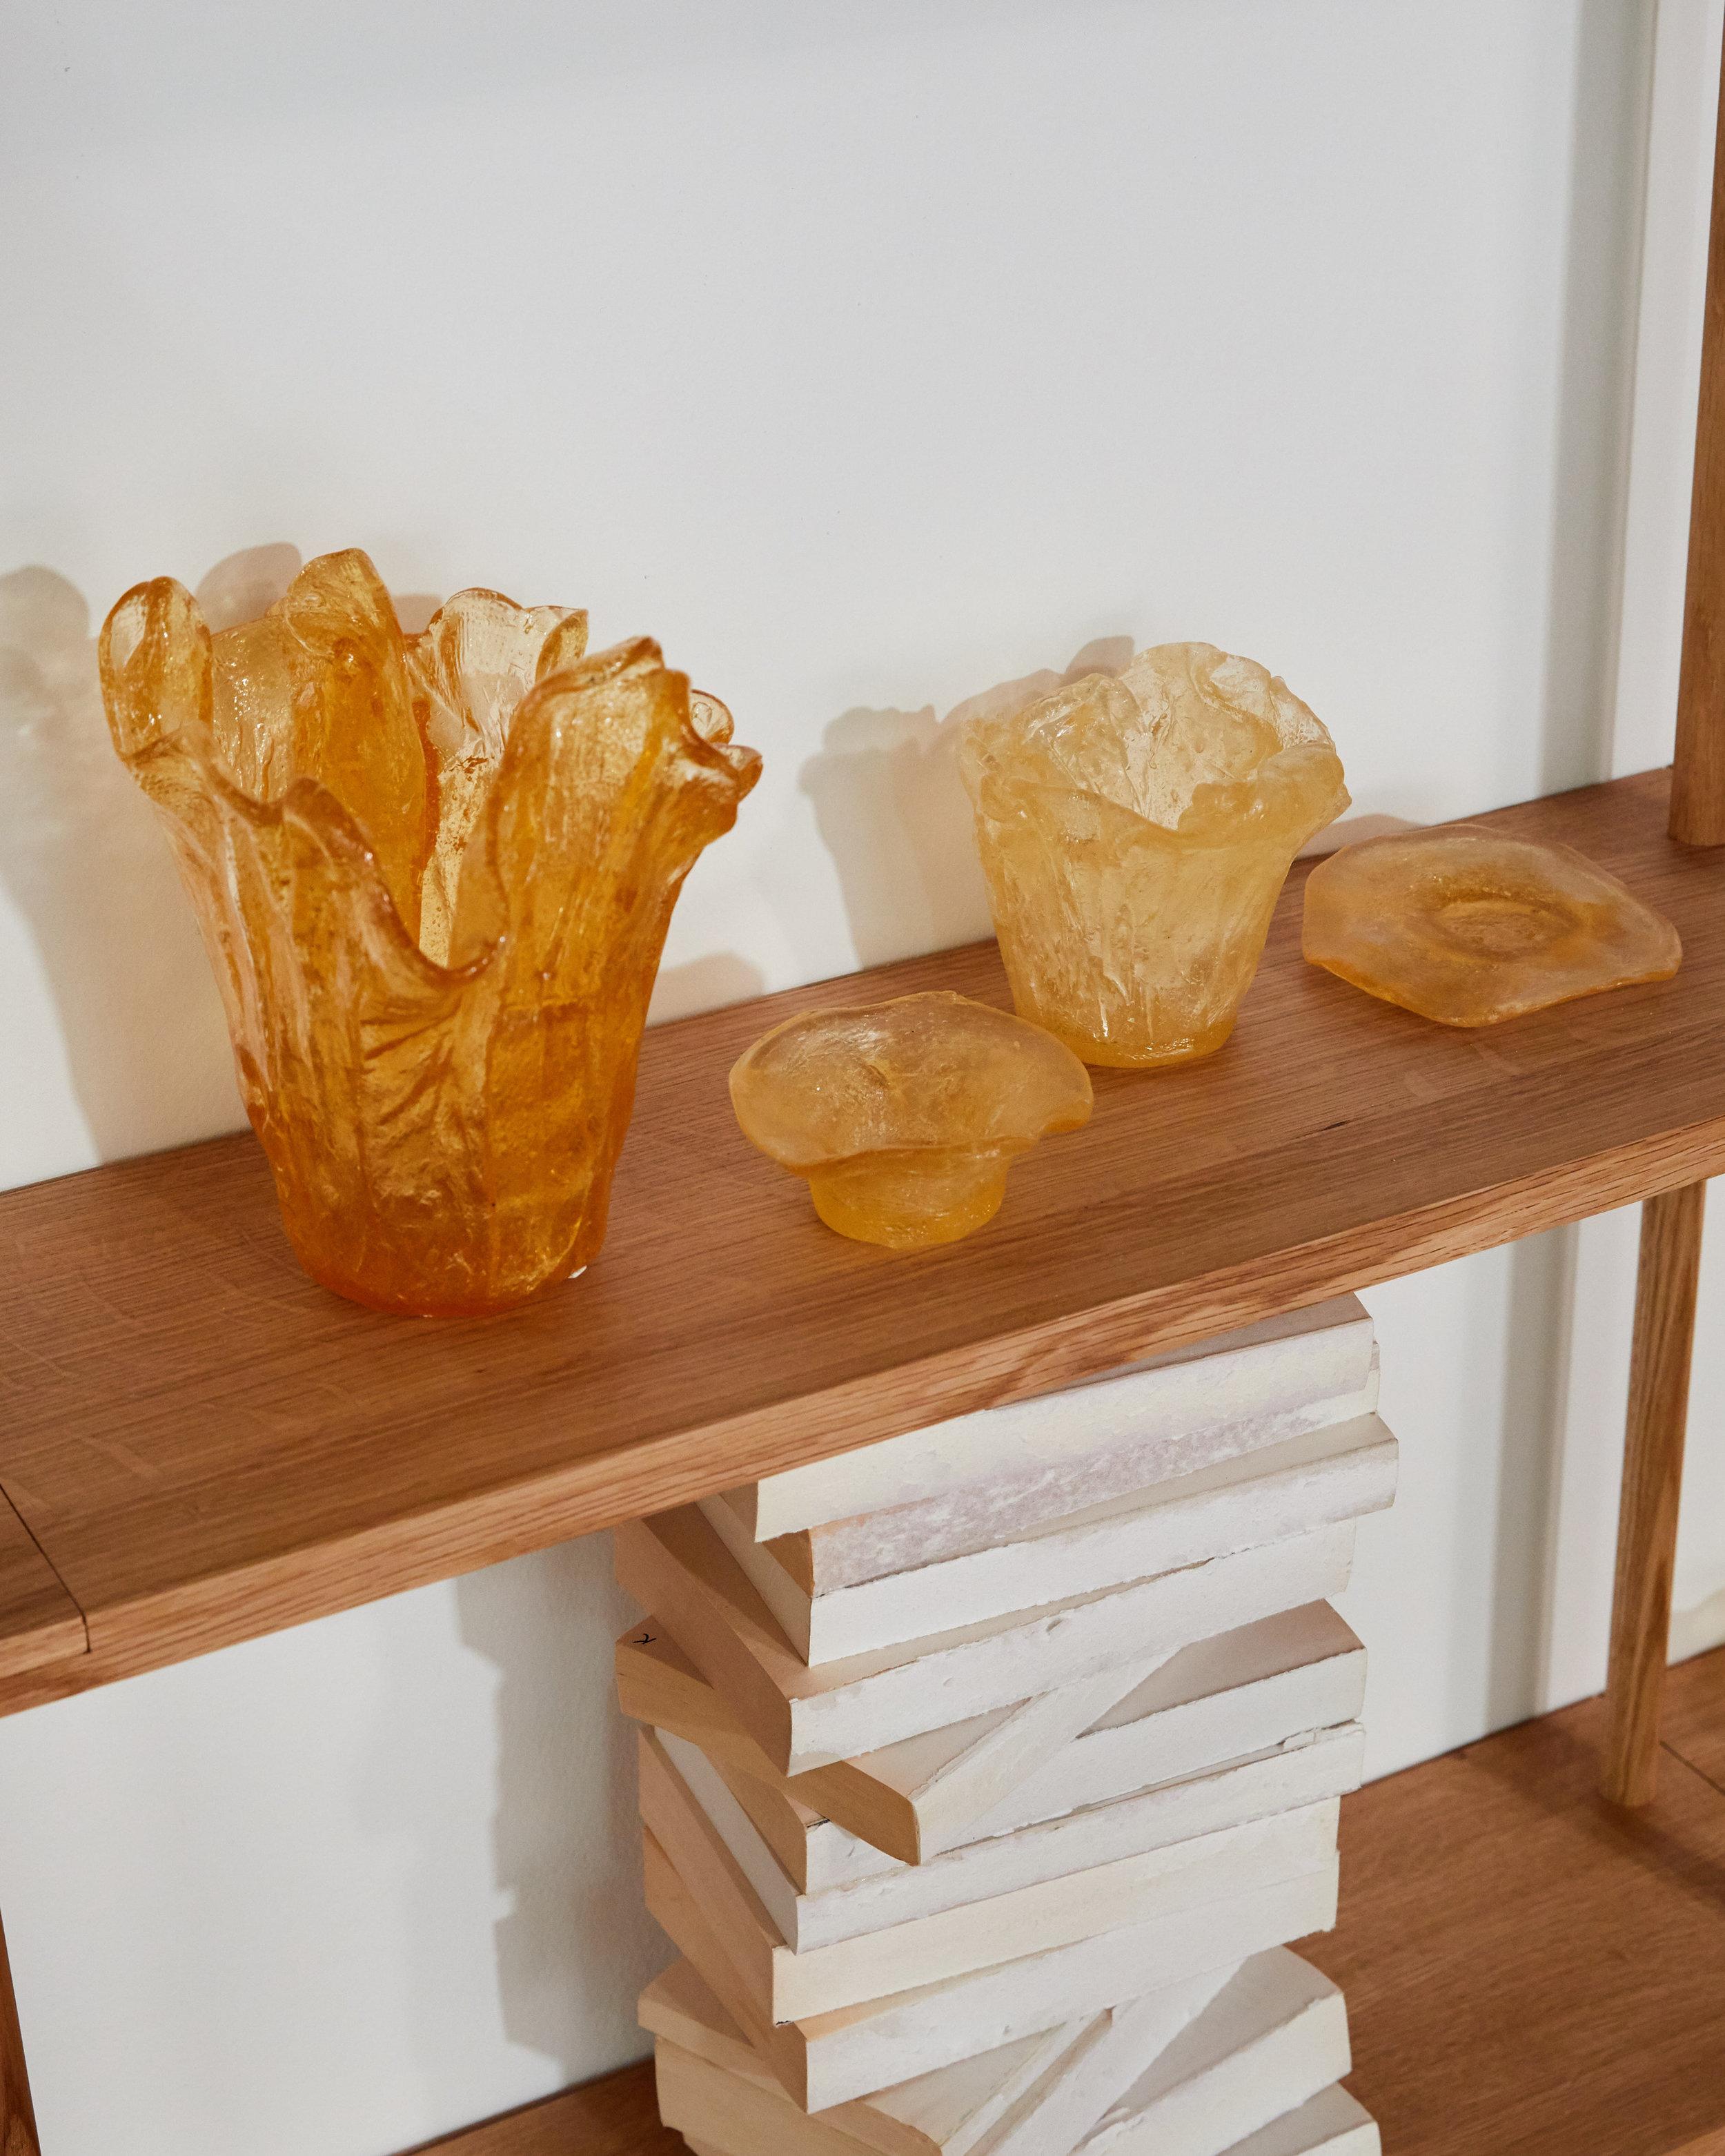 HDK_Shaping ephemerality plates bowls_lr.jpg